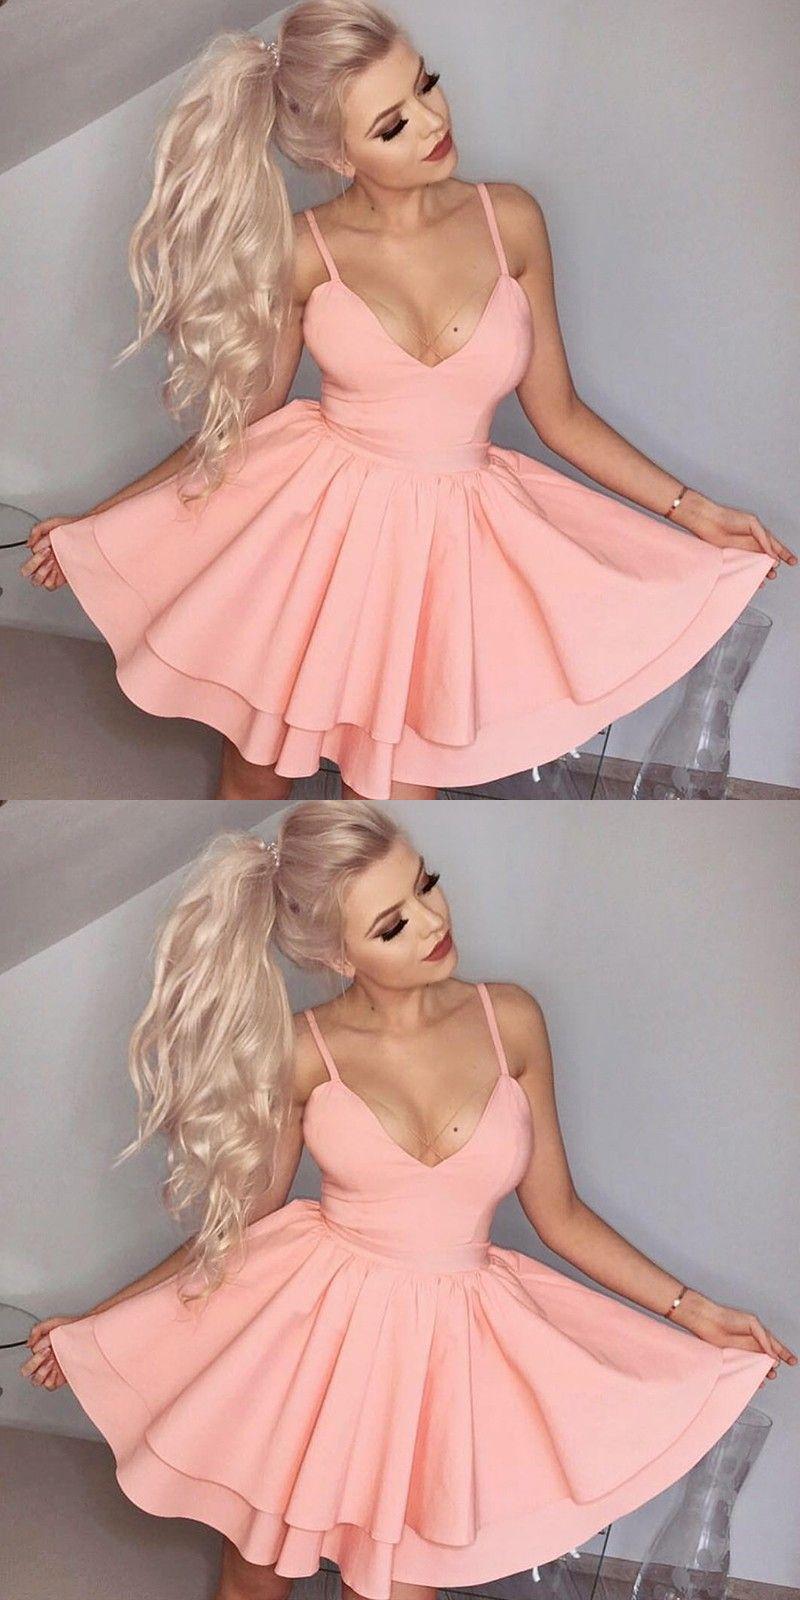 Spaghetti Straps Dresses,Short Homecoming Dresses,Pink Dresses,Homecoming Dresses 2017,Cocktail Dresses,tight Homecoming Dresses